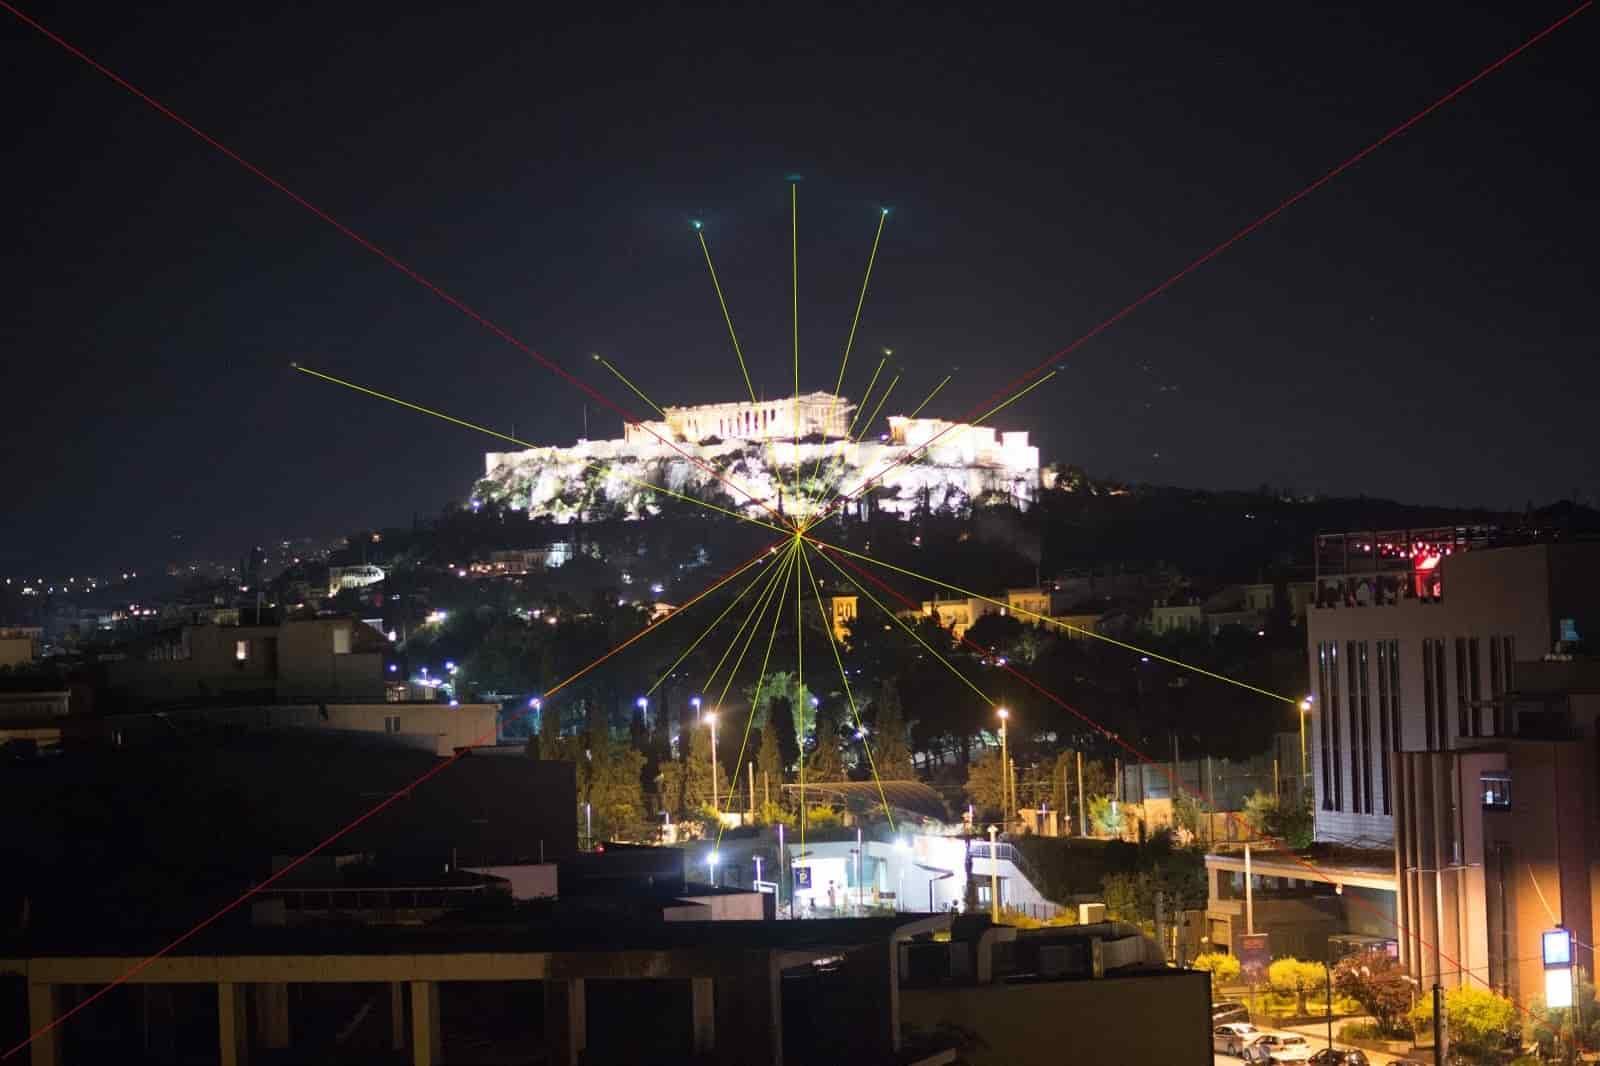 UFO Επάνω Από τον Παρθενώνα στο Θερινό Ηλιοστάσιο! (εικόνες)